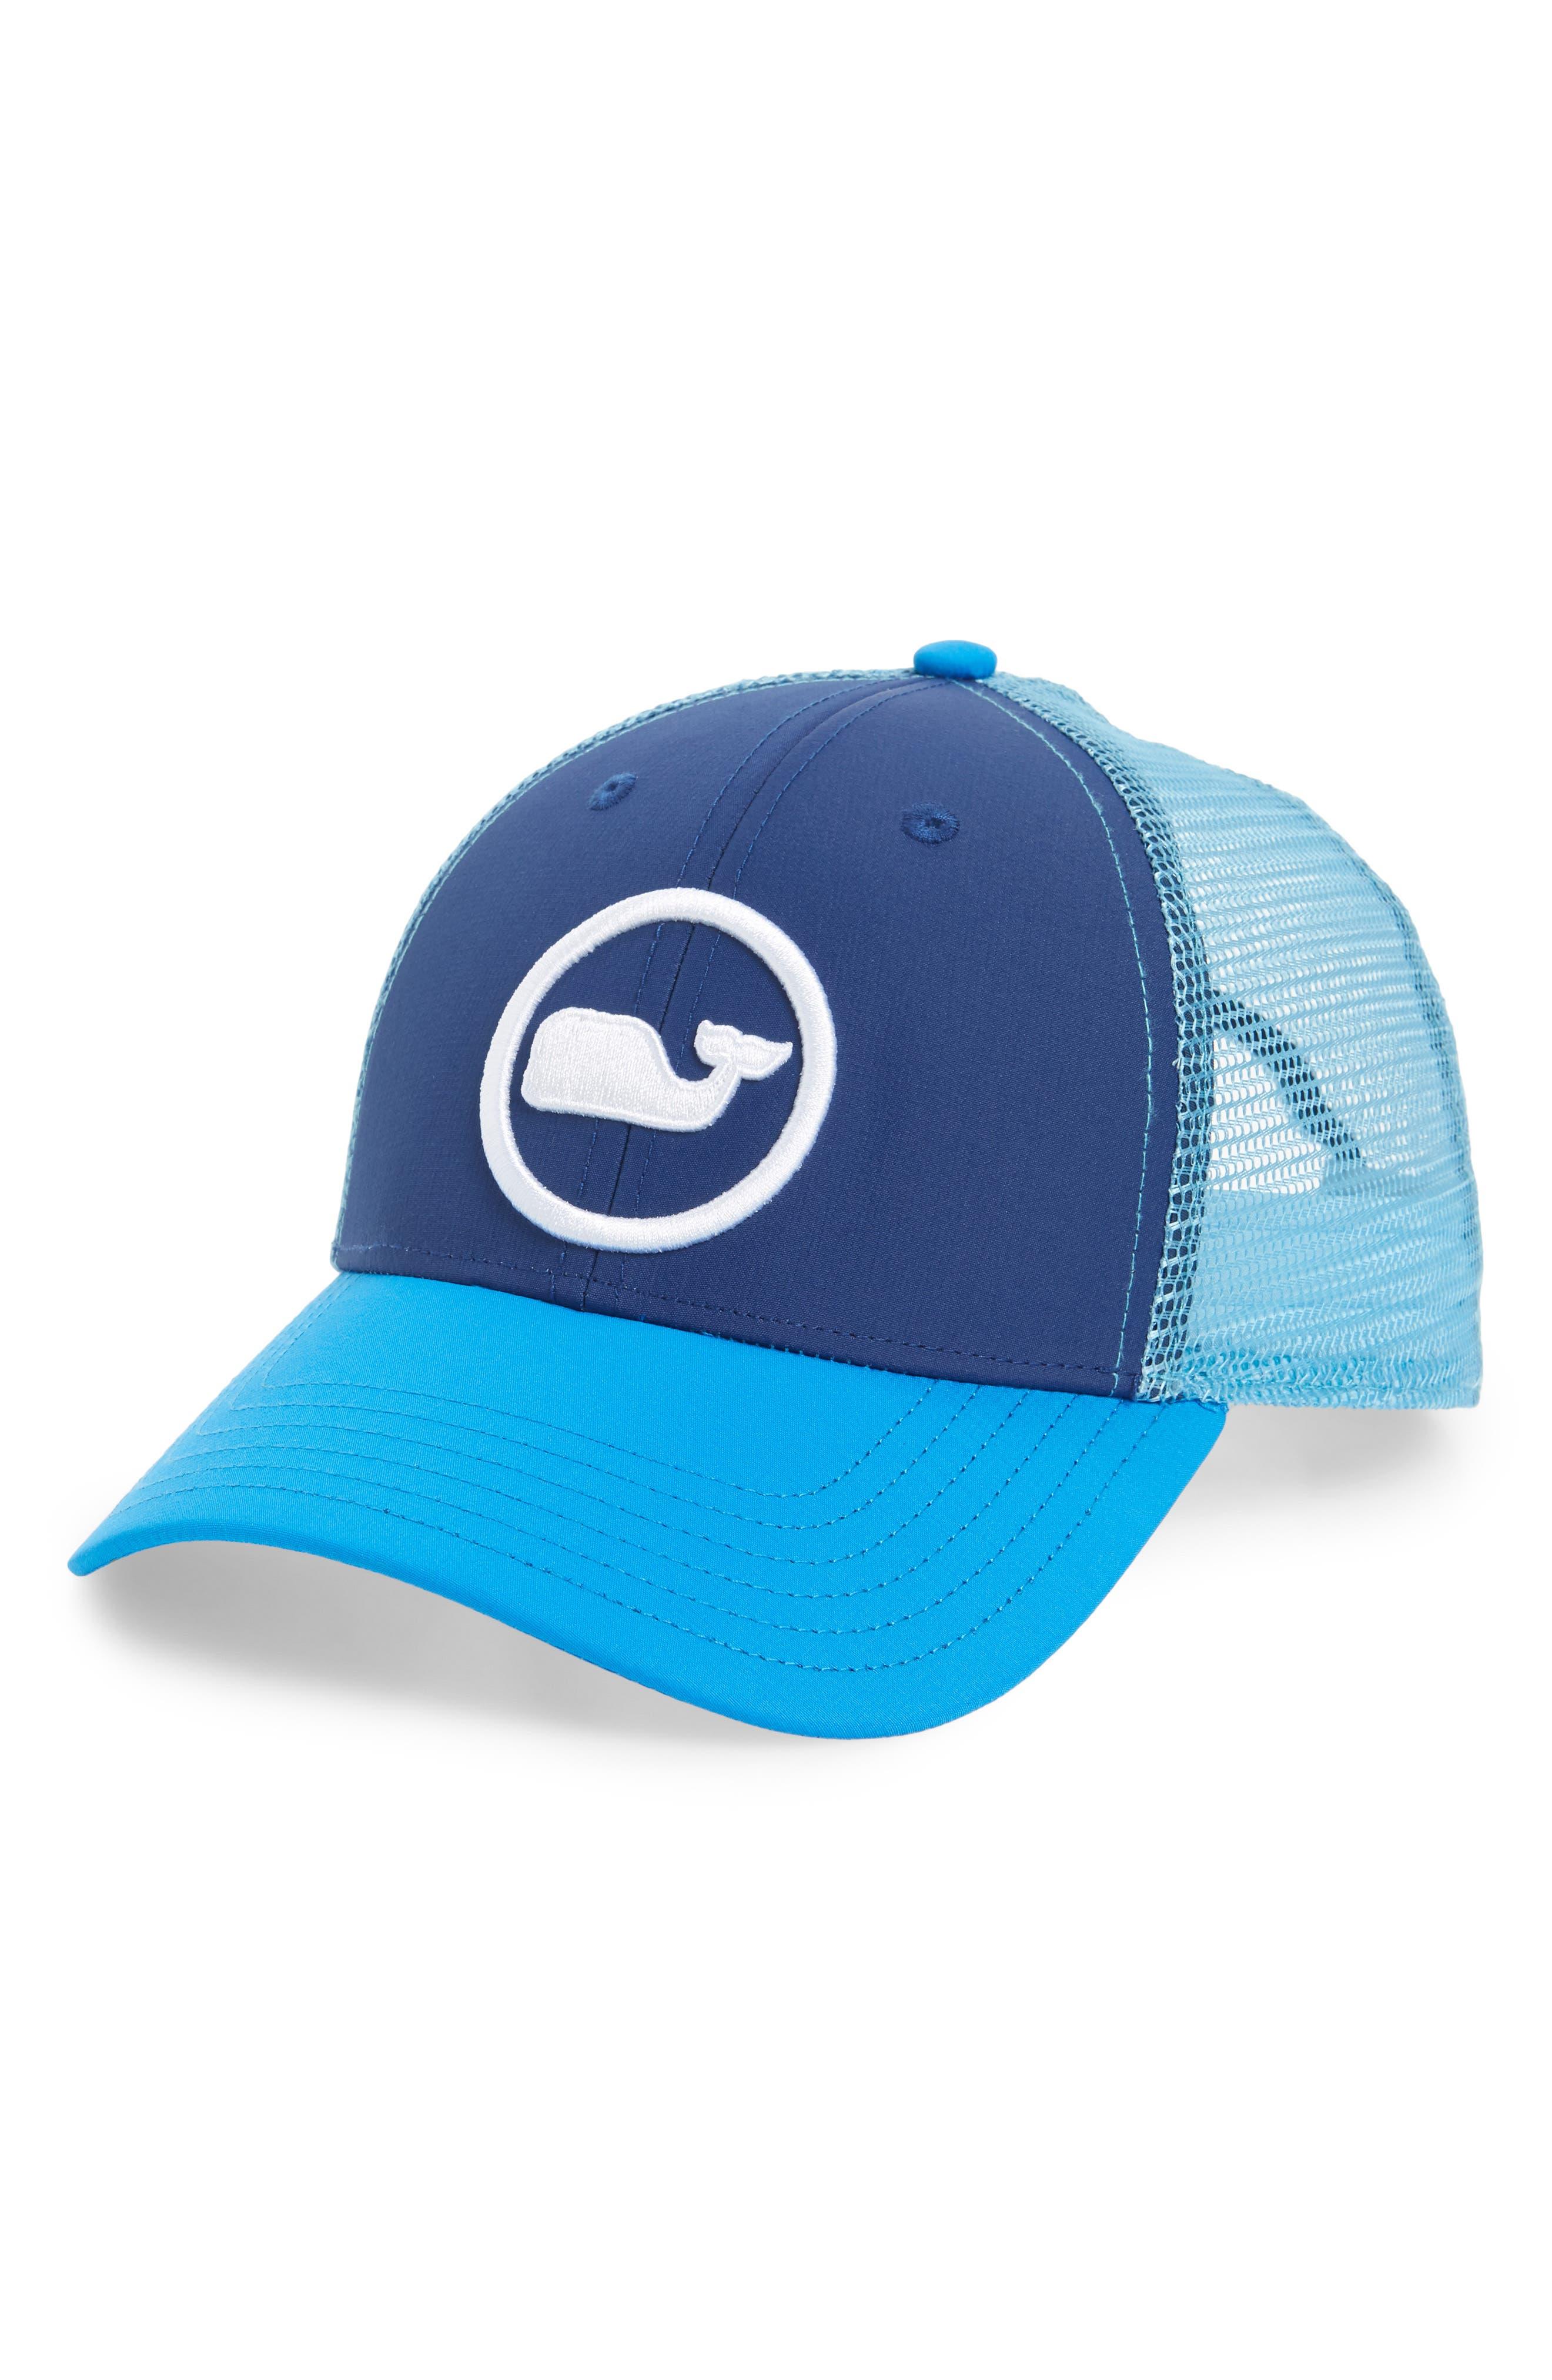 Vineyard Vines Whale Dot Trucker Cap - Blue In Moonshine  529d05b8b32f